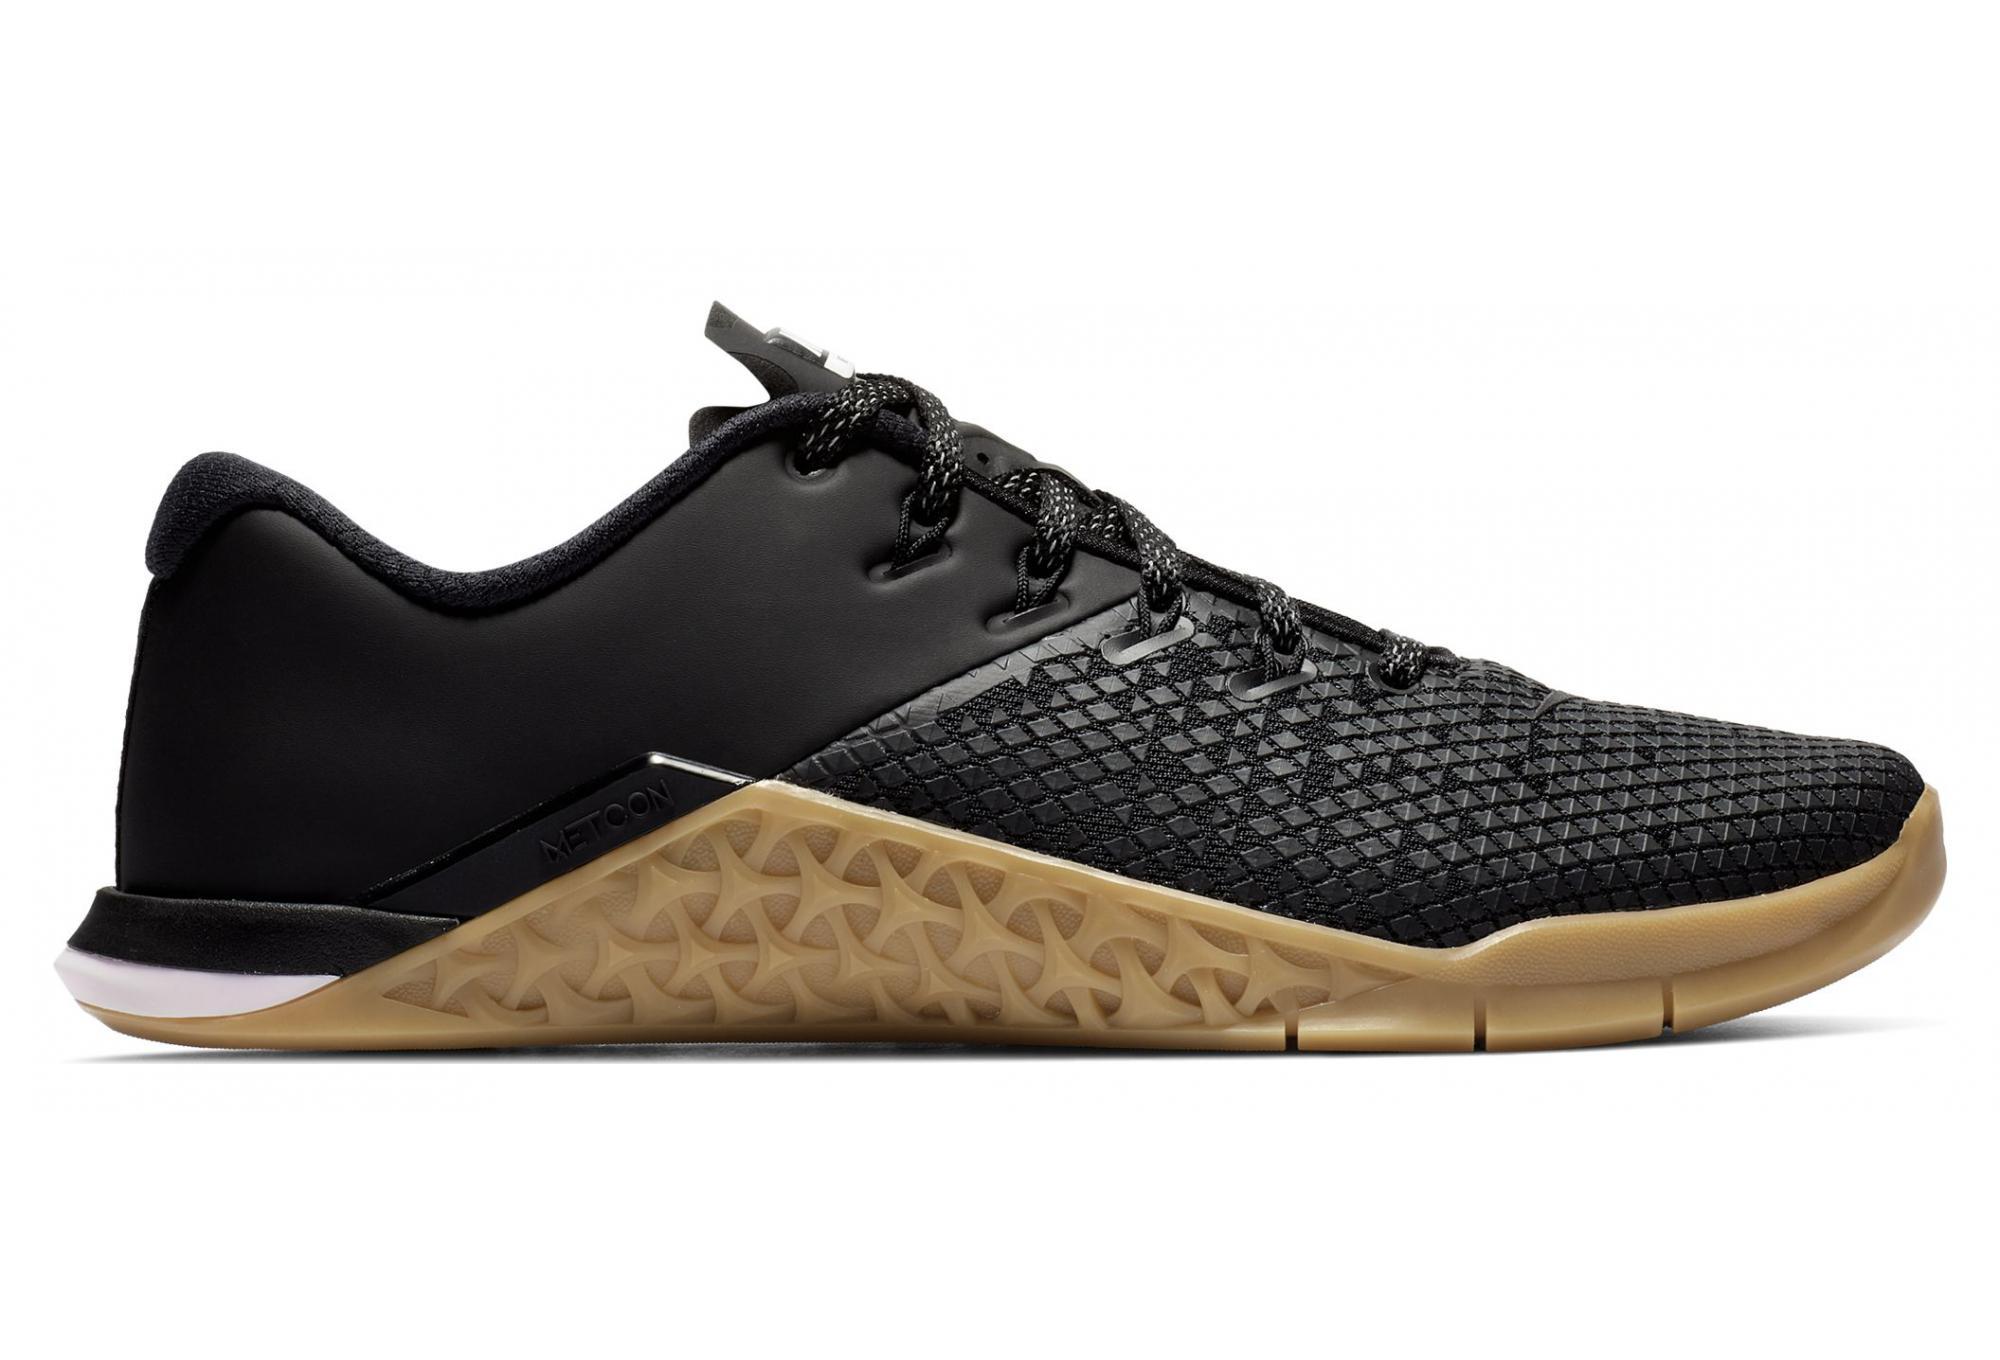 Nike Femme Noir 4 Metcon Xd Gum AjL5qR34